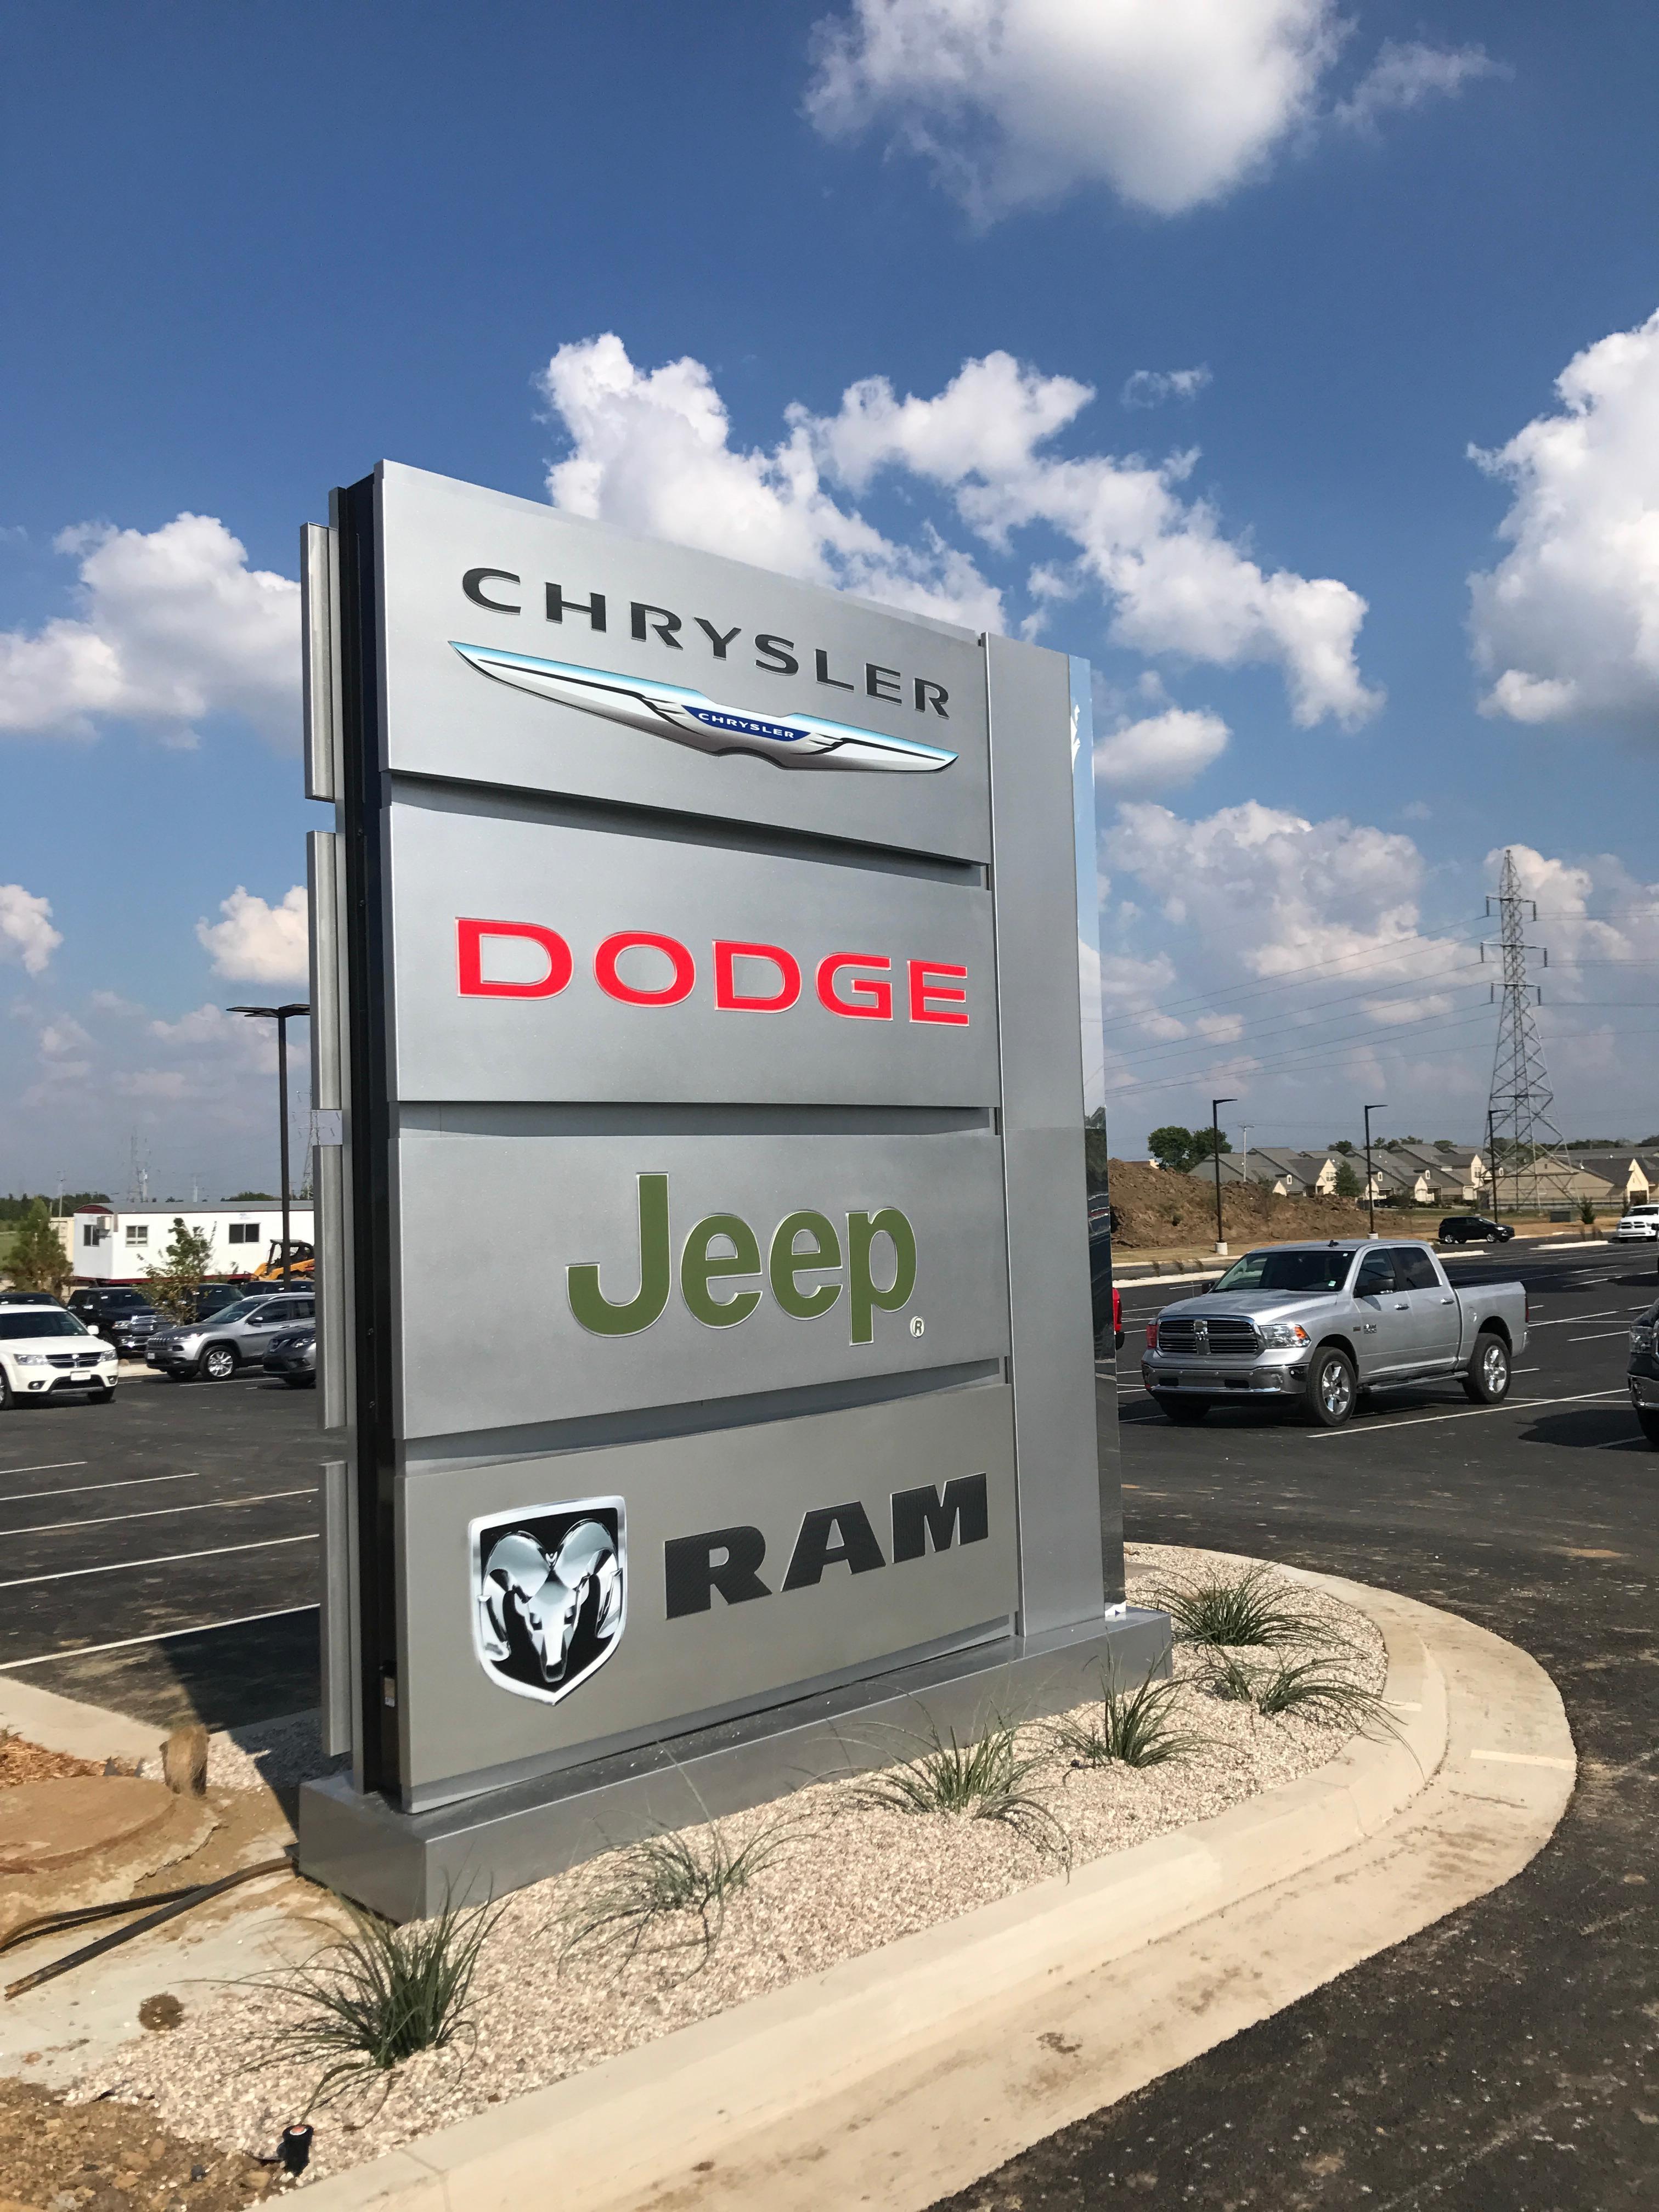 Jim Glover Dodge Chrysler Jeep Ram Fiat 10505 N Owasso Expressway